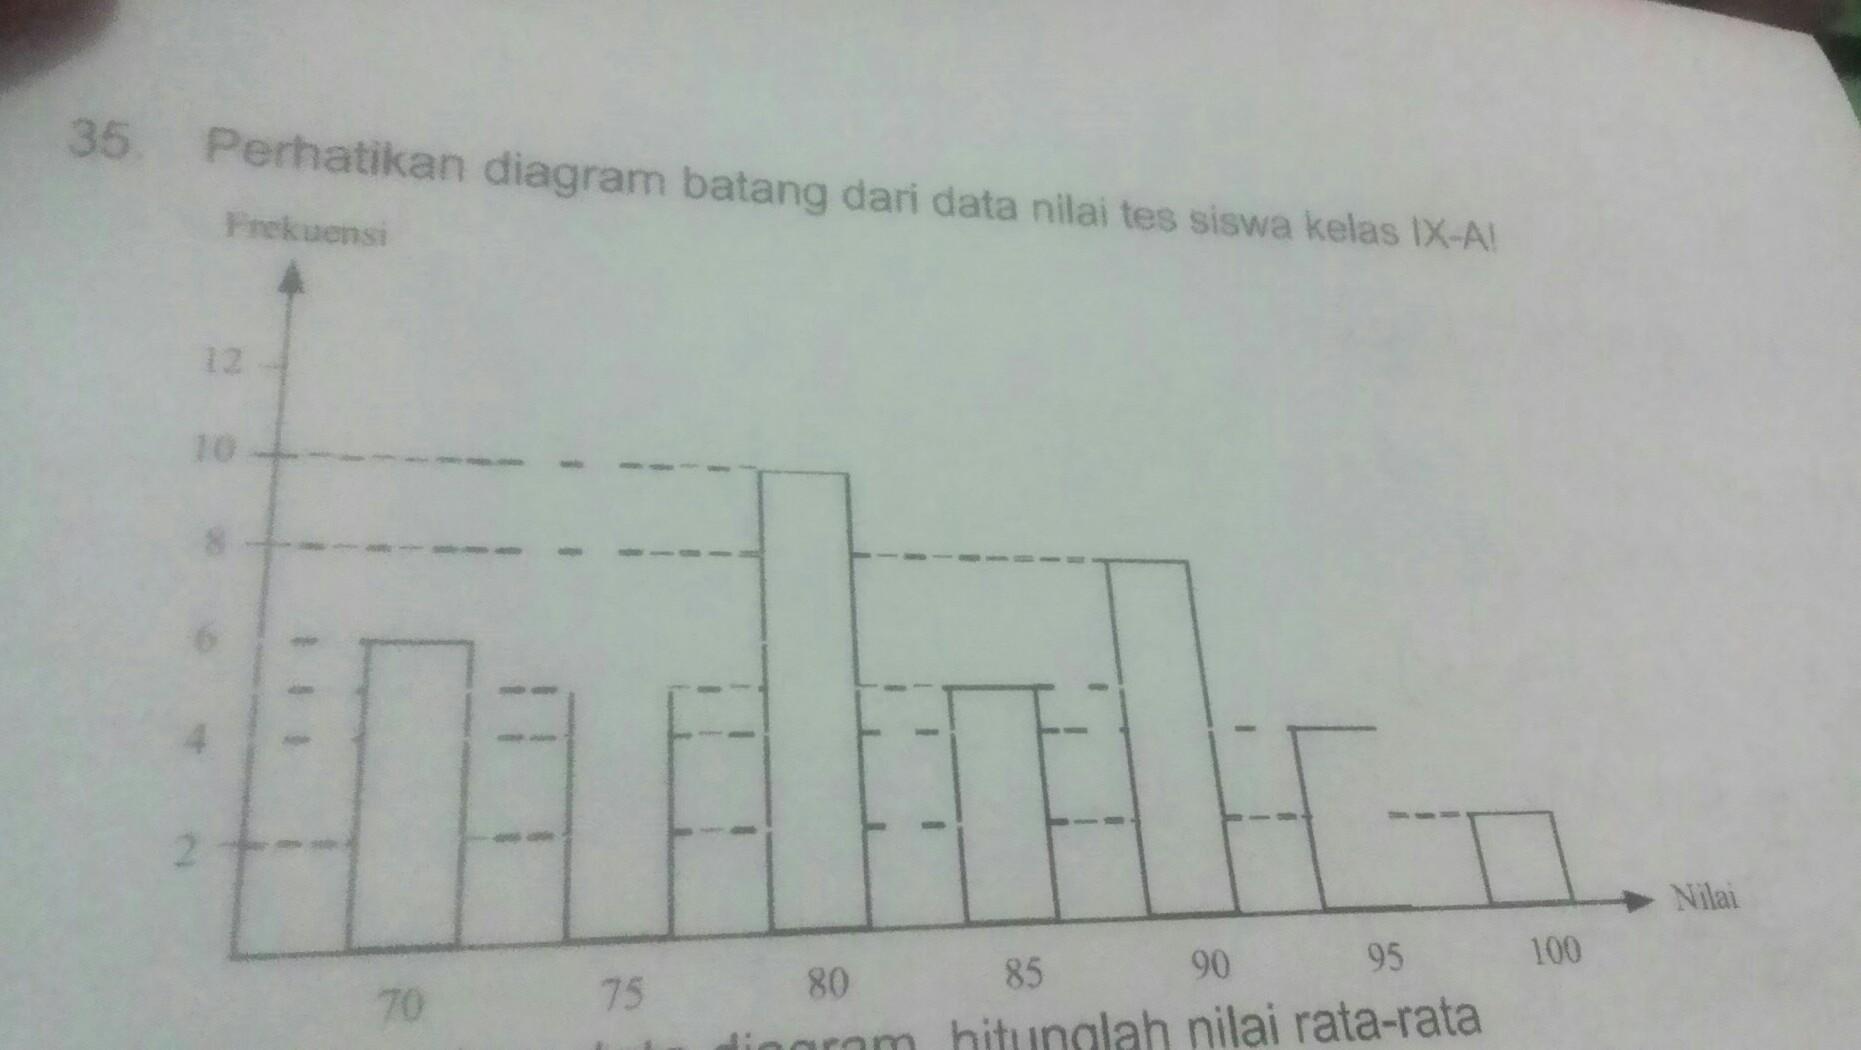 A berdasarkan data diagram hitunglah nilai rata kelas tersebut a berdasarkan data diagram hitunglah nilai rata kelas tersebut tuliskan langkah langkah penyelesaiannya jumlah nilaijumlah siswadan nilai rata ccuart Gallery